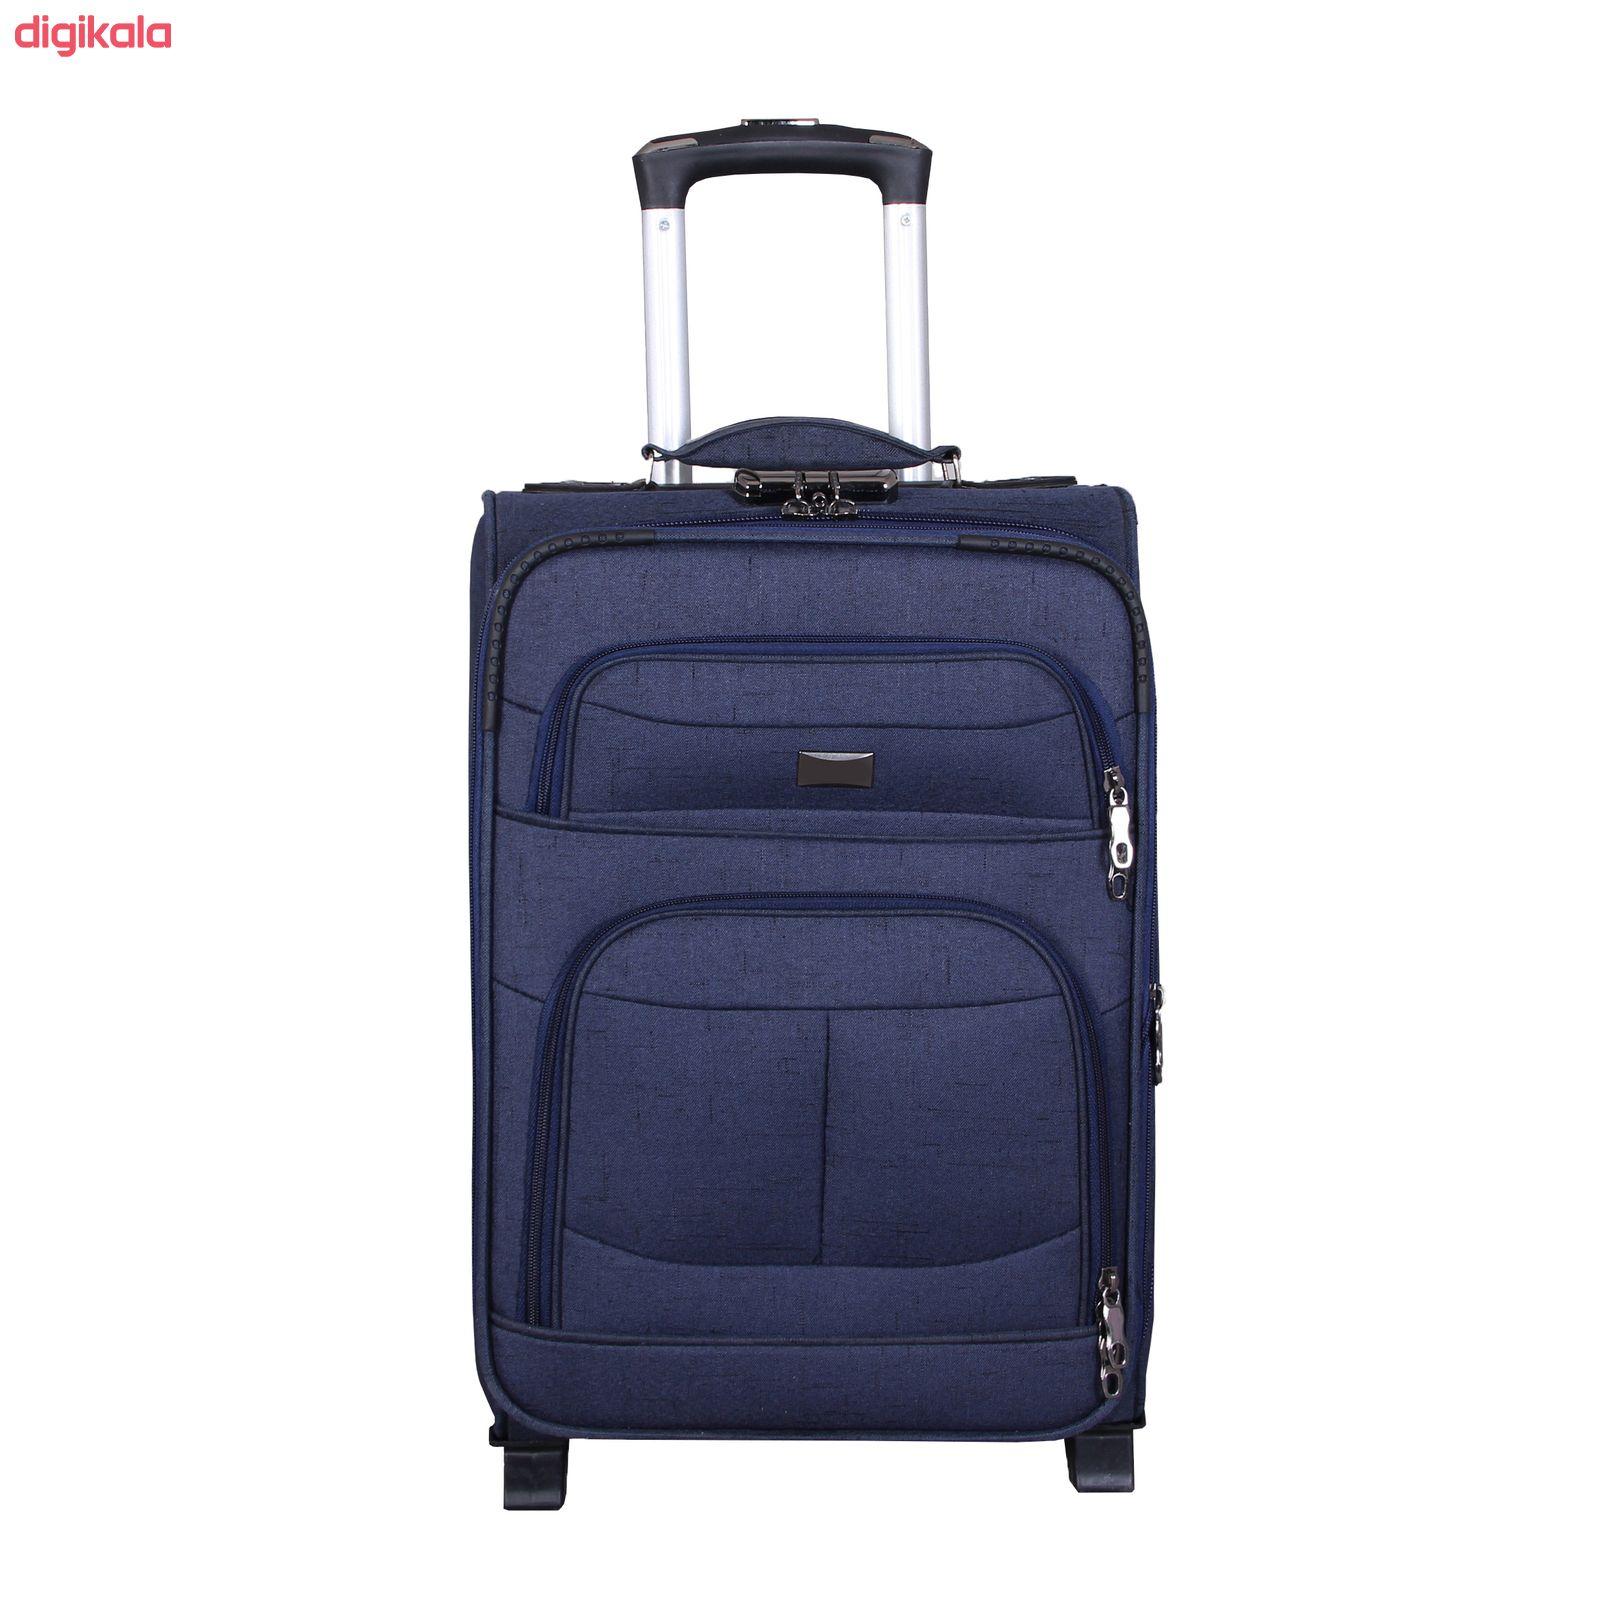 مجموعه سه عددی چمدان کد 2301A main 1 5